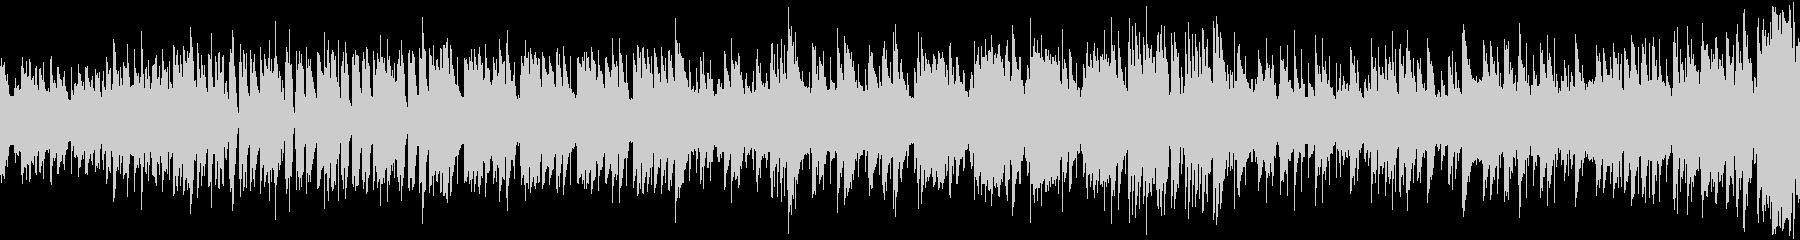 8bit スペースチックな曲 ループ仕様の未再生の波形